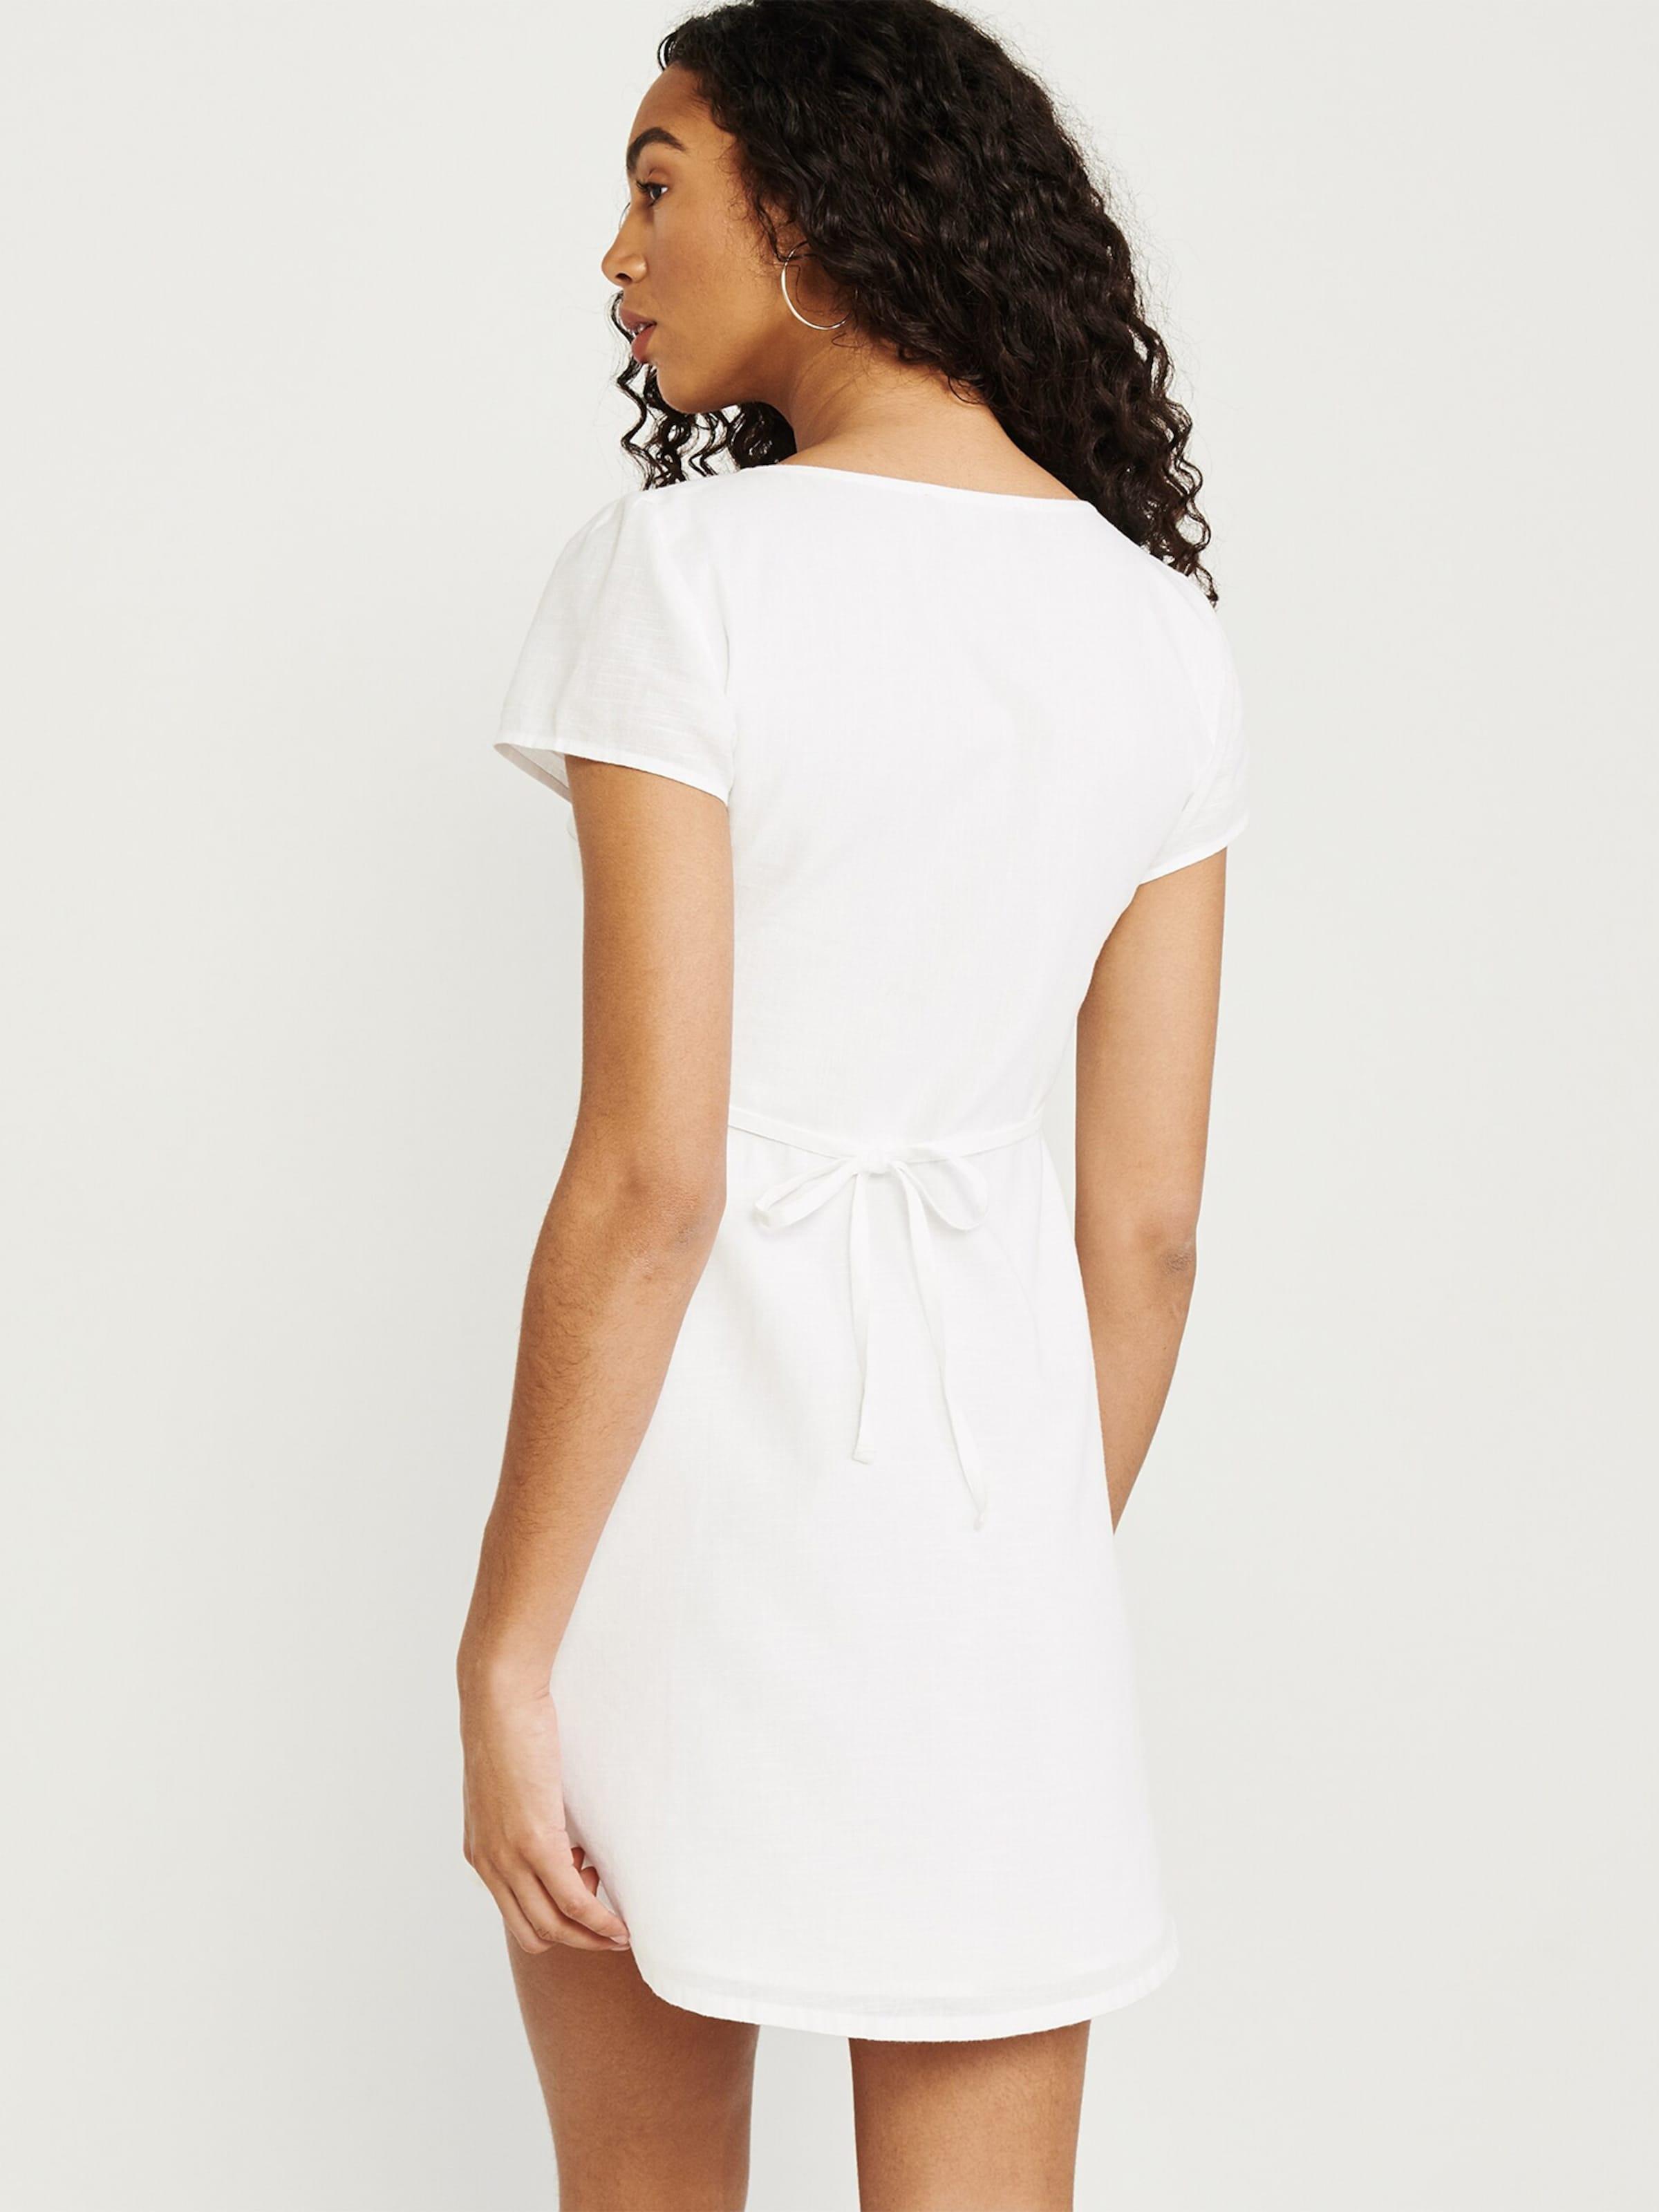 Kleid Weiß Abercrombieamp; In Fitch Abercrombieamp; Kleid Abercrombieamp; Fitch Fitch In Weiß JFuKl31Tc